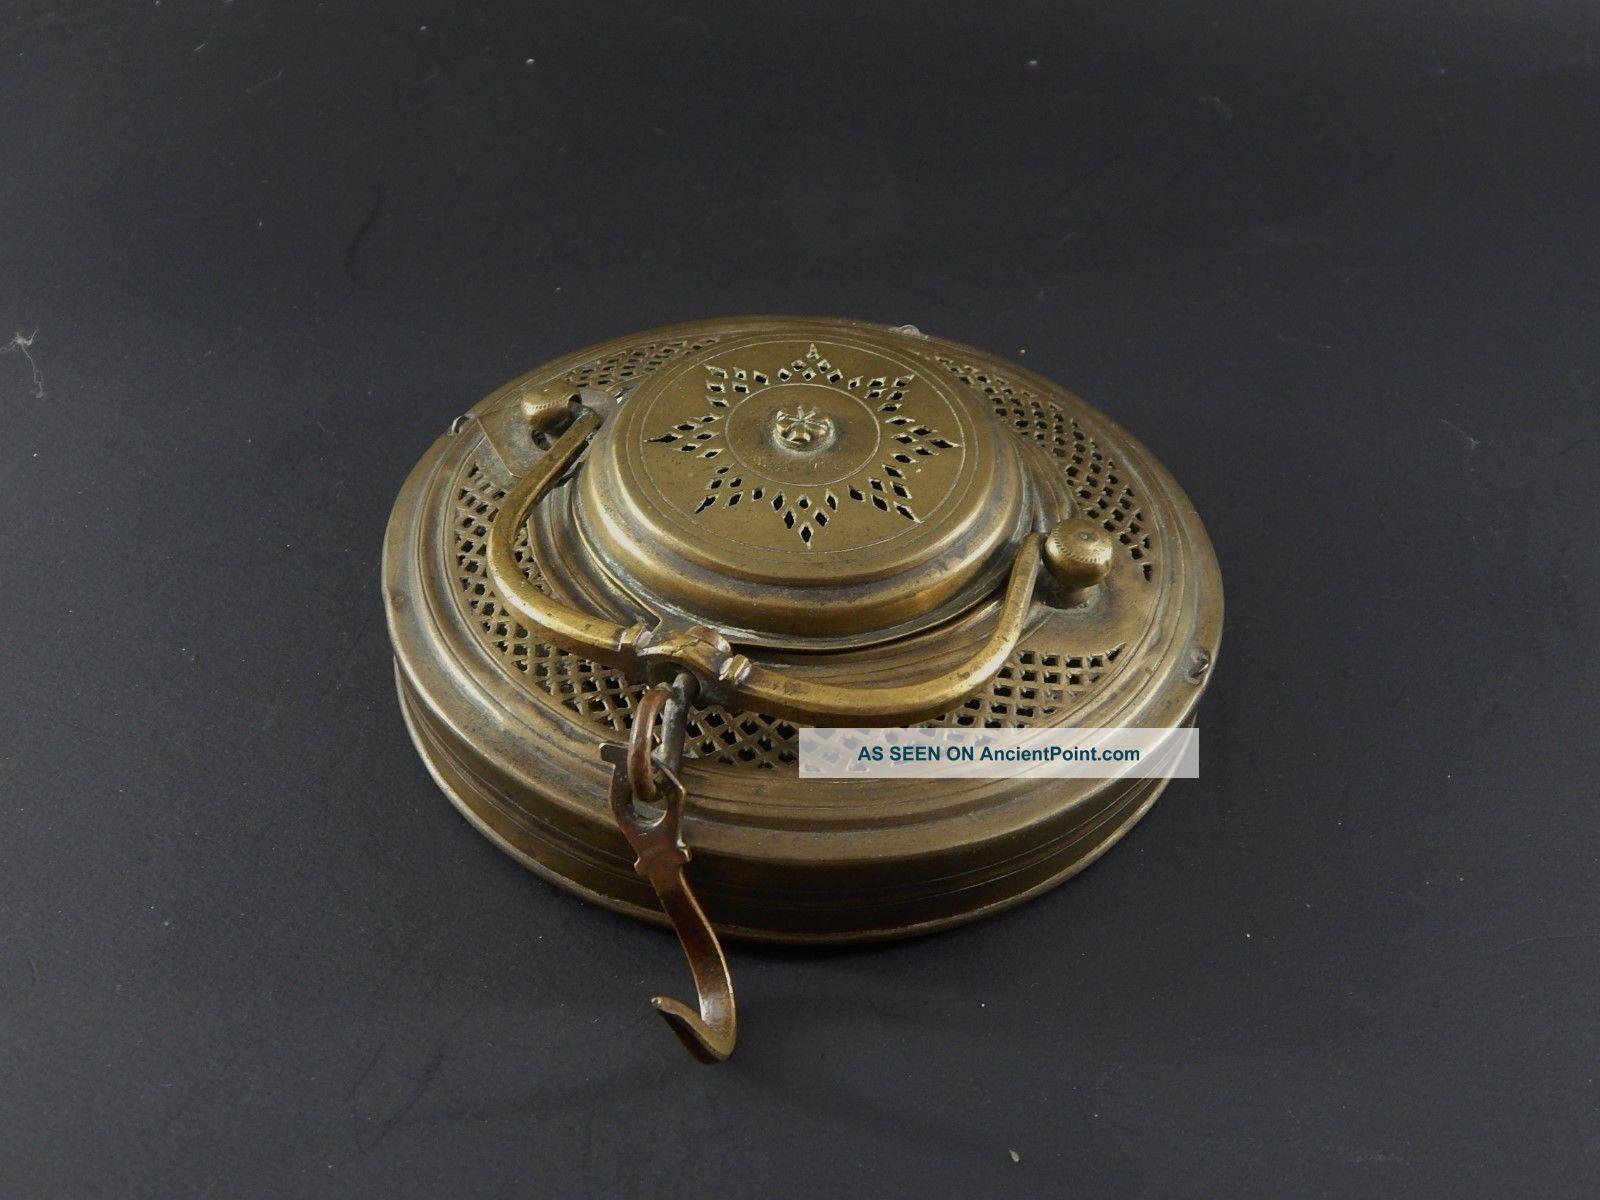 Fine Antique Persian Pierced & Engraved Brass Hanging Kadjar Candle Lamp Signed Islamic photo